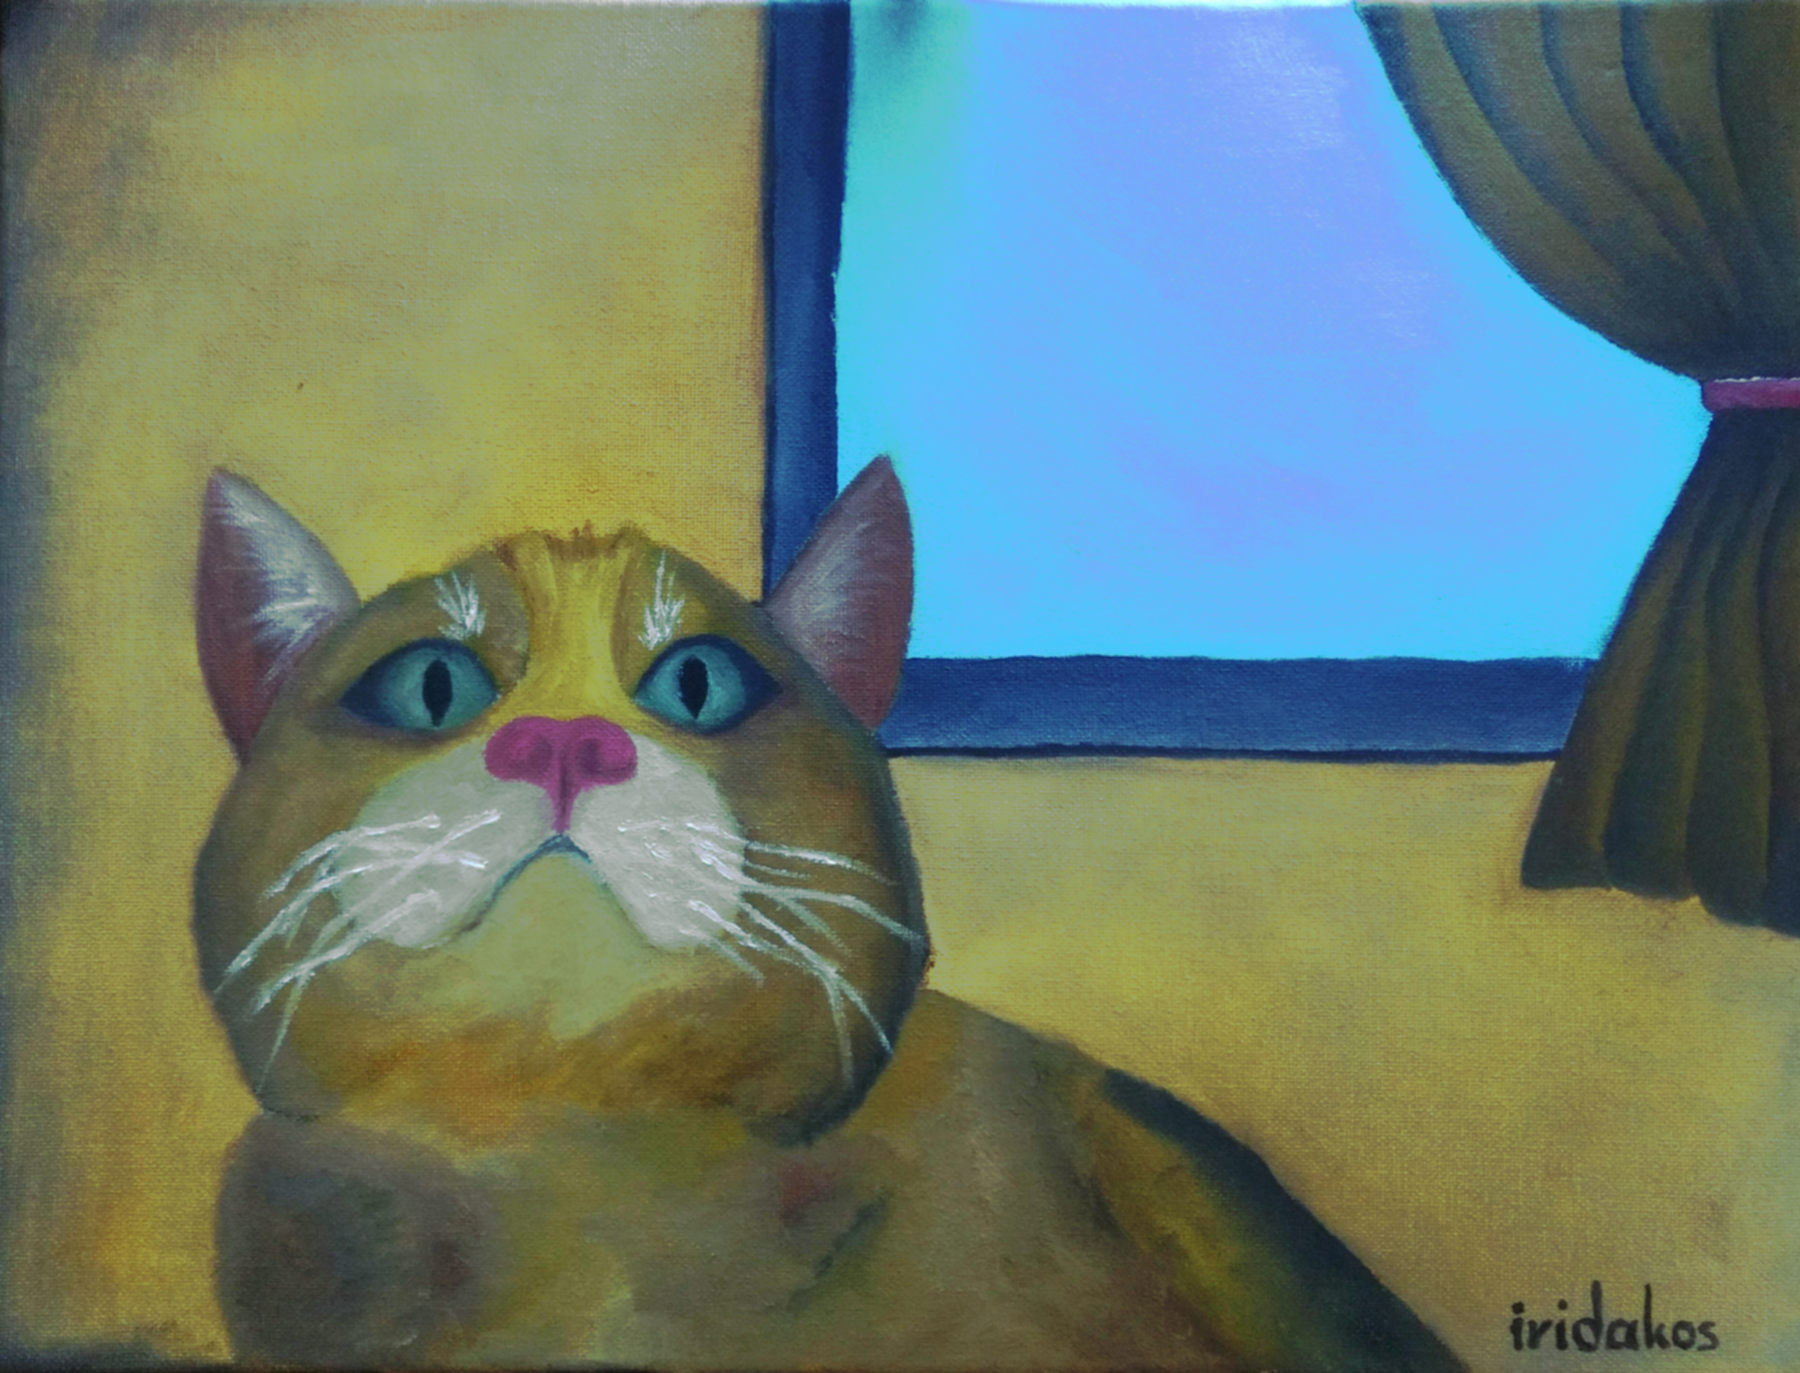 Picatso painting